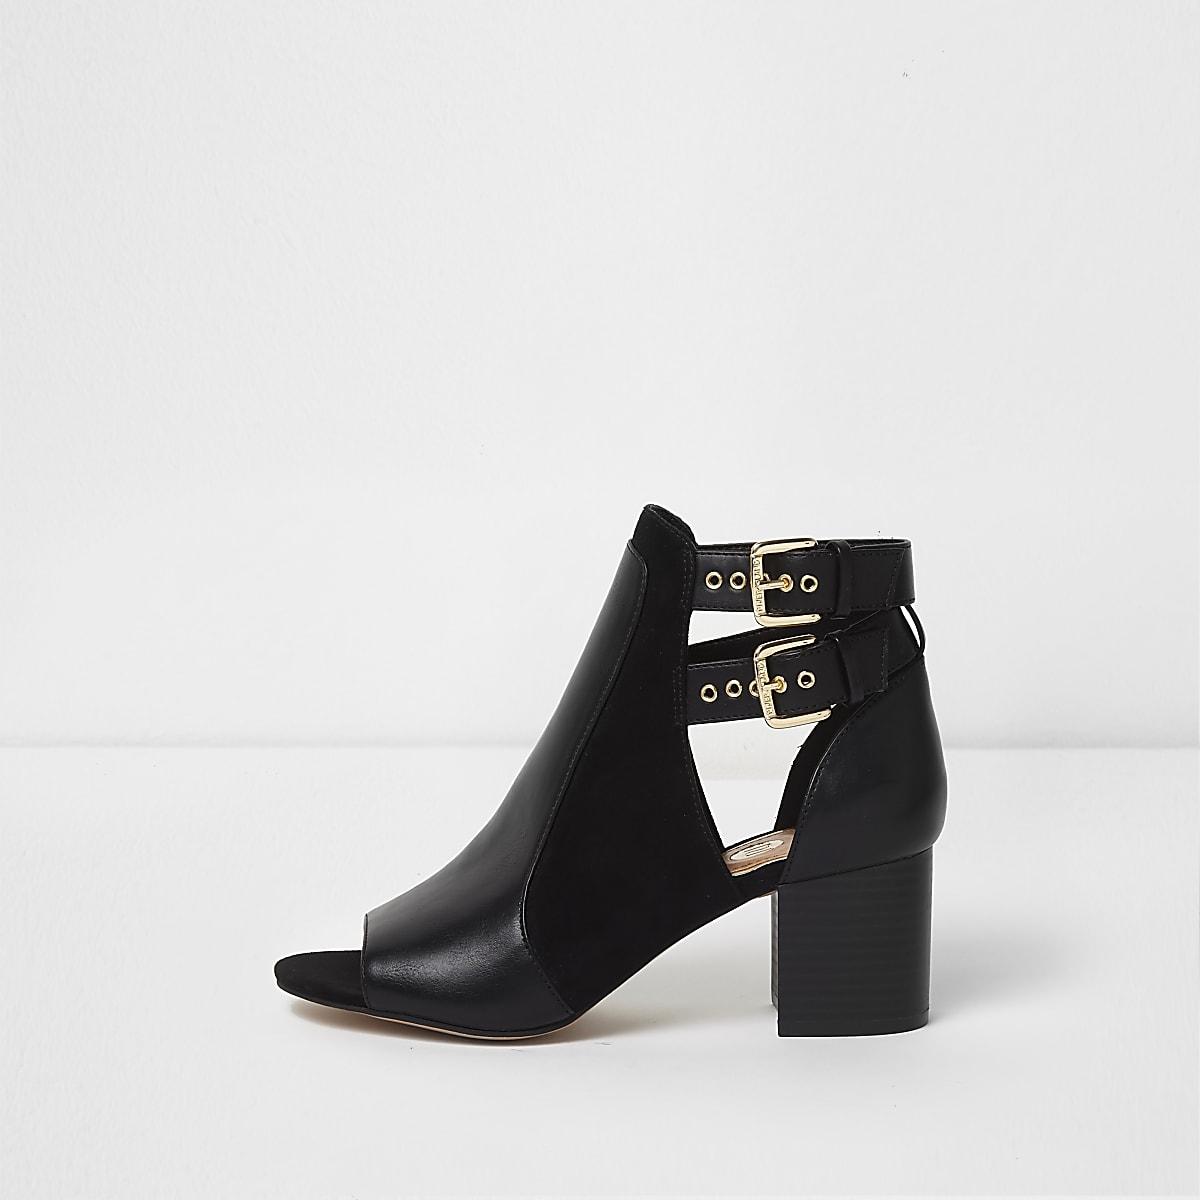 Schwarze Shoe Boots mit Peeptoe und Doppelschnalle